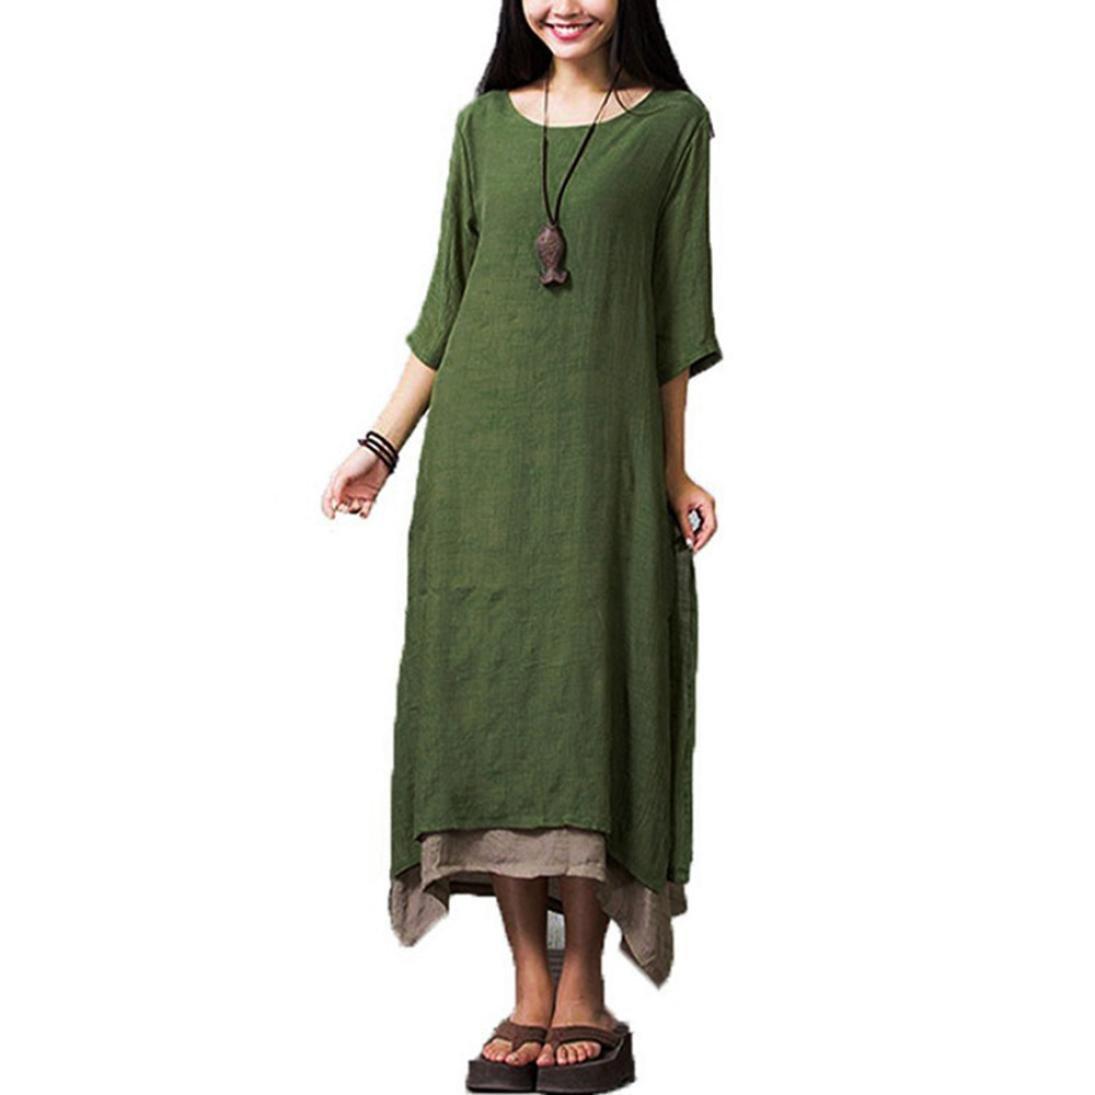 Hmlai Cotton Linen Dress, Women Retro 3/4 Sleeve Double Layer Casual Loose Maxi Dress Plus Size (Army Green, L)